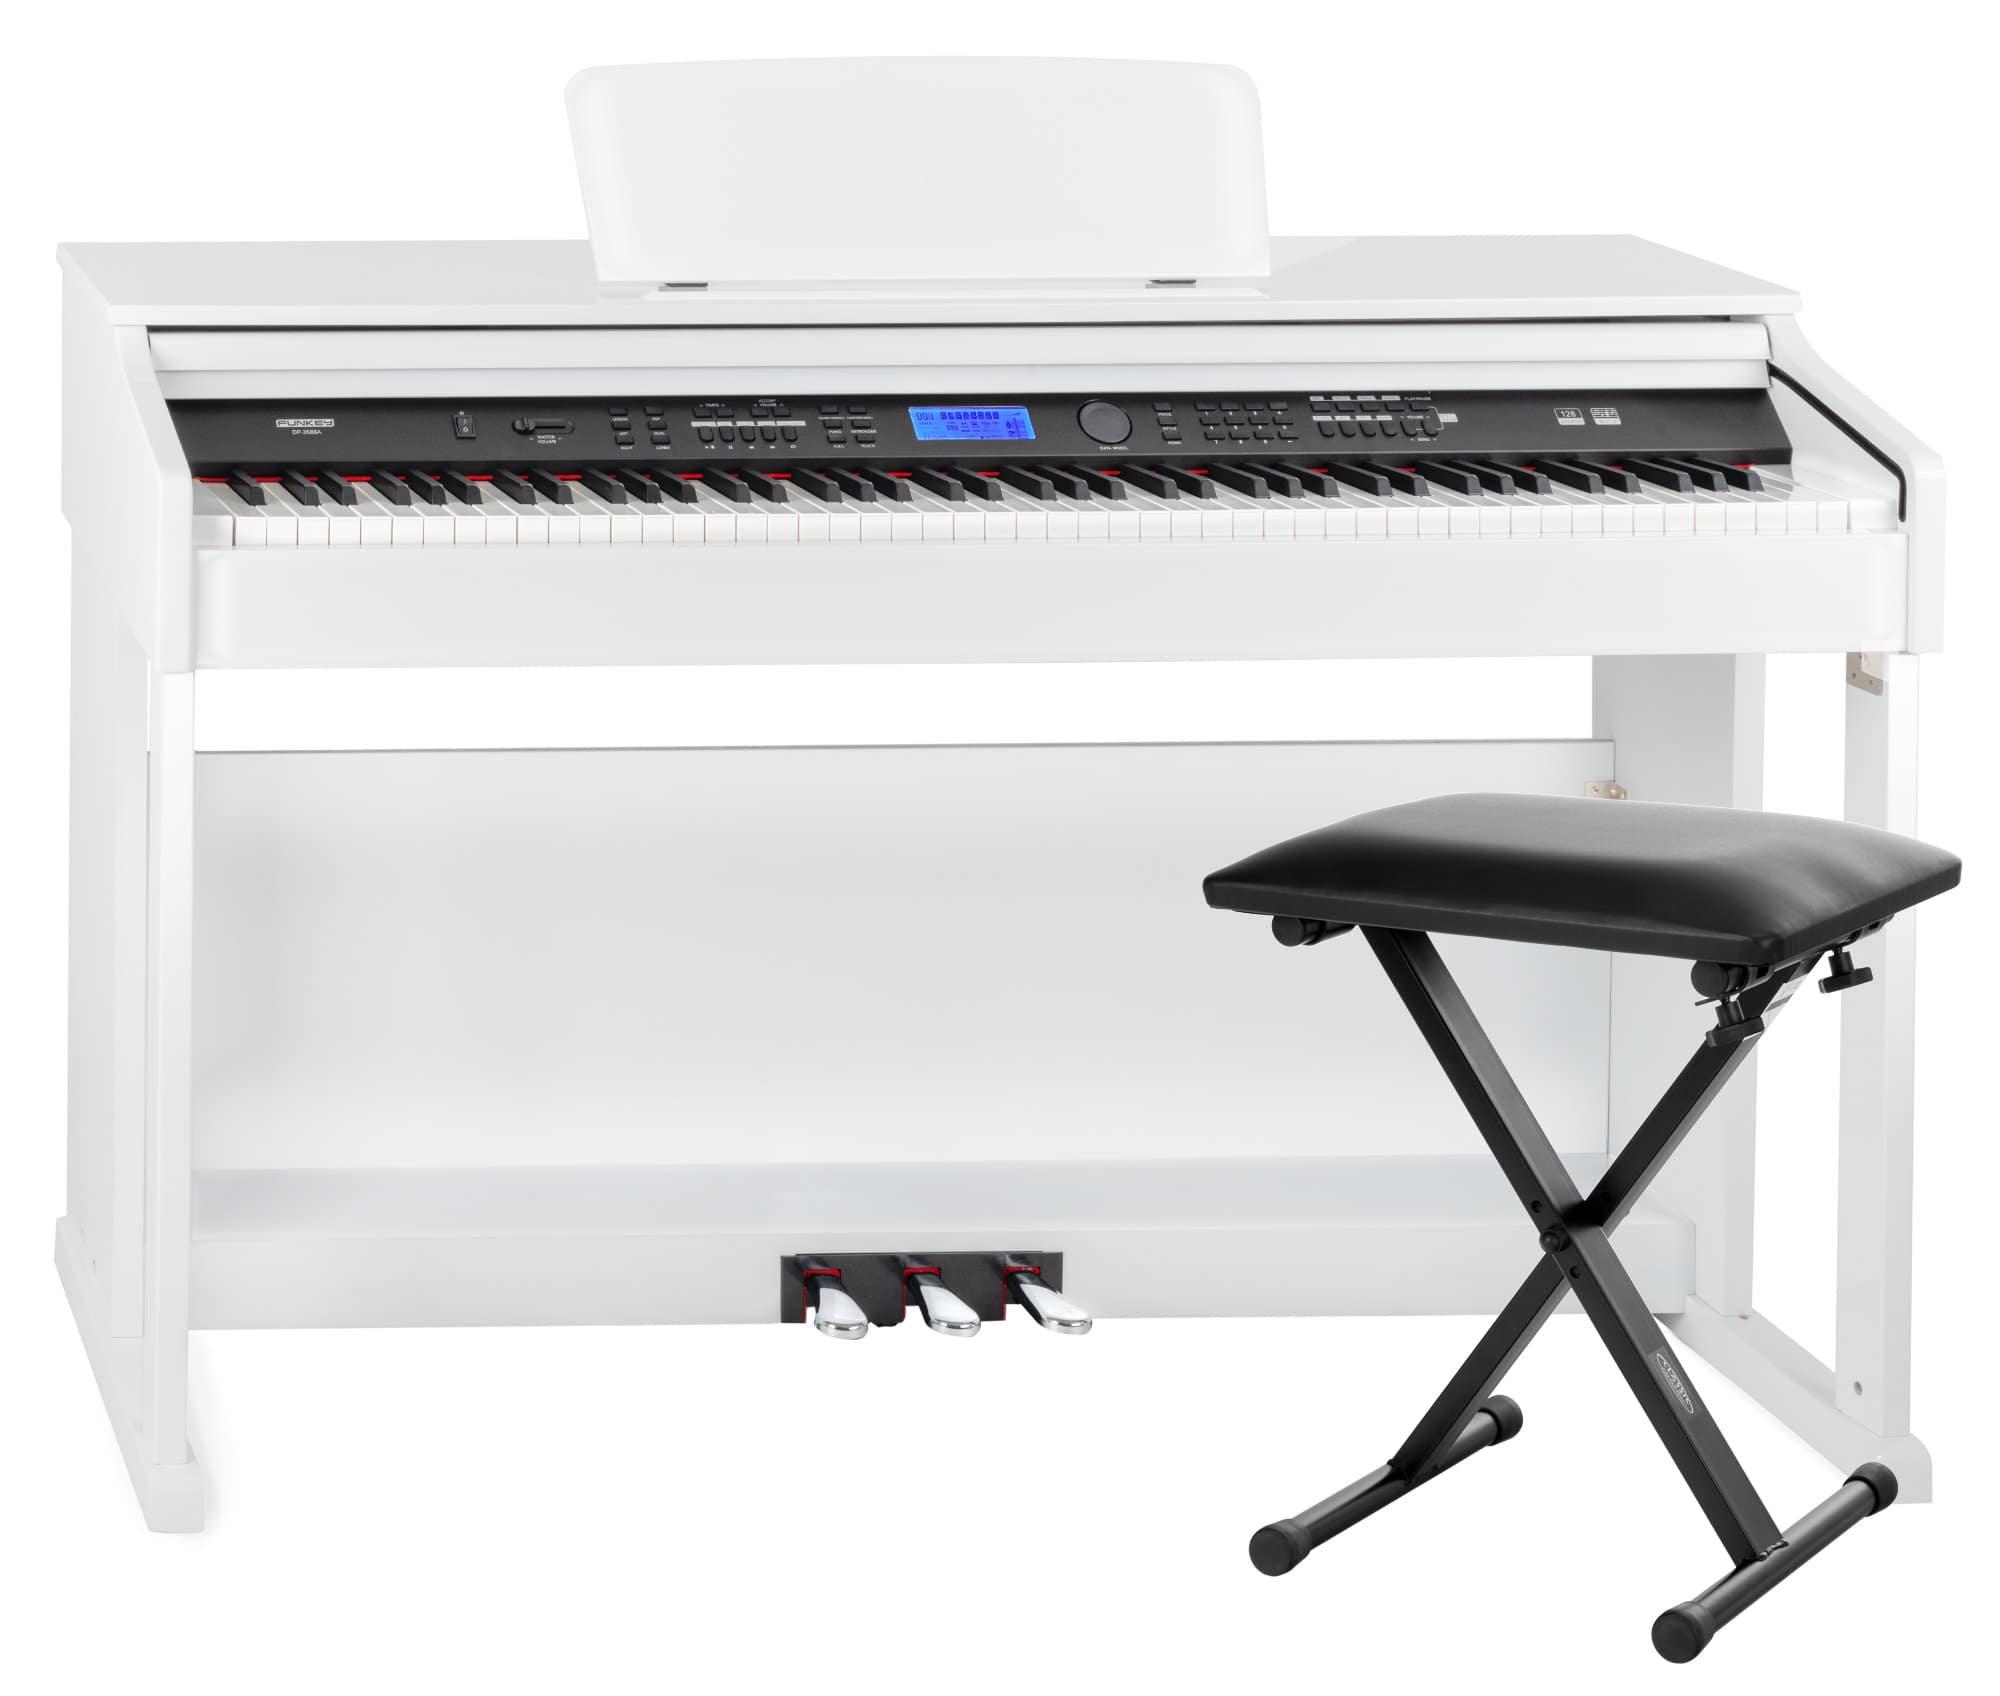 Digitalpianos - FunKey DP 2688A WH Digitalpiano weiß Hochglanz Economy Bank Set - Onlineshop Musikhaus Kirstein